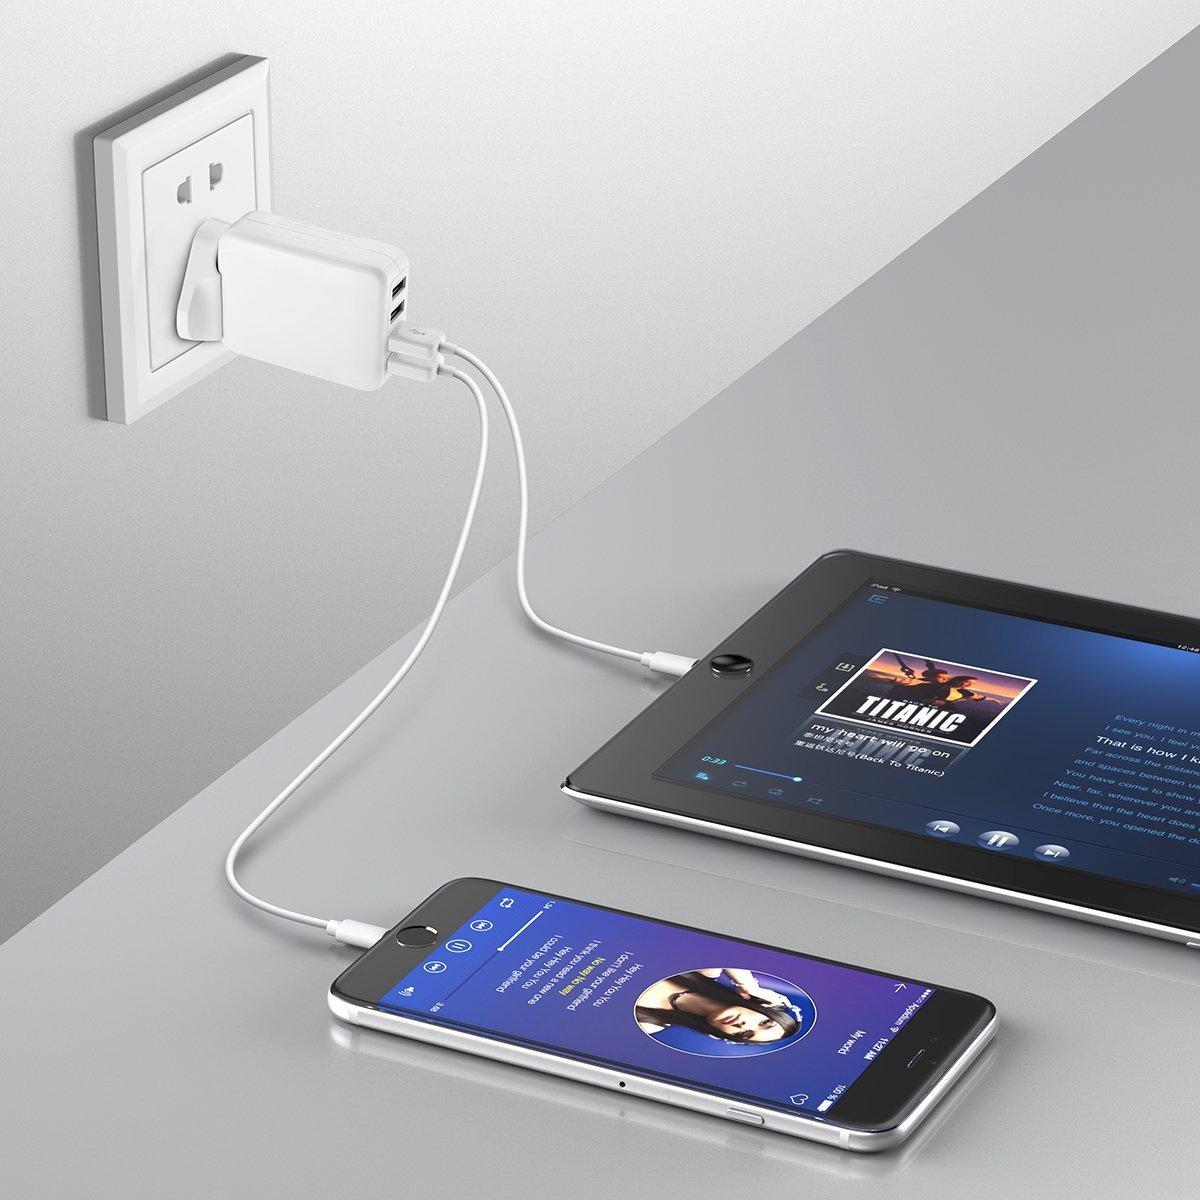 POWERADD Reiseadapter 4 Port USB Ladegerät mit UK EU US AU Internationaler Austauschbarer Reisestecker für iPhone, Tablet, Externer Akku